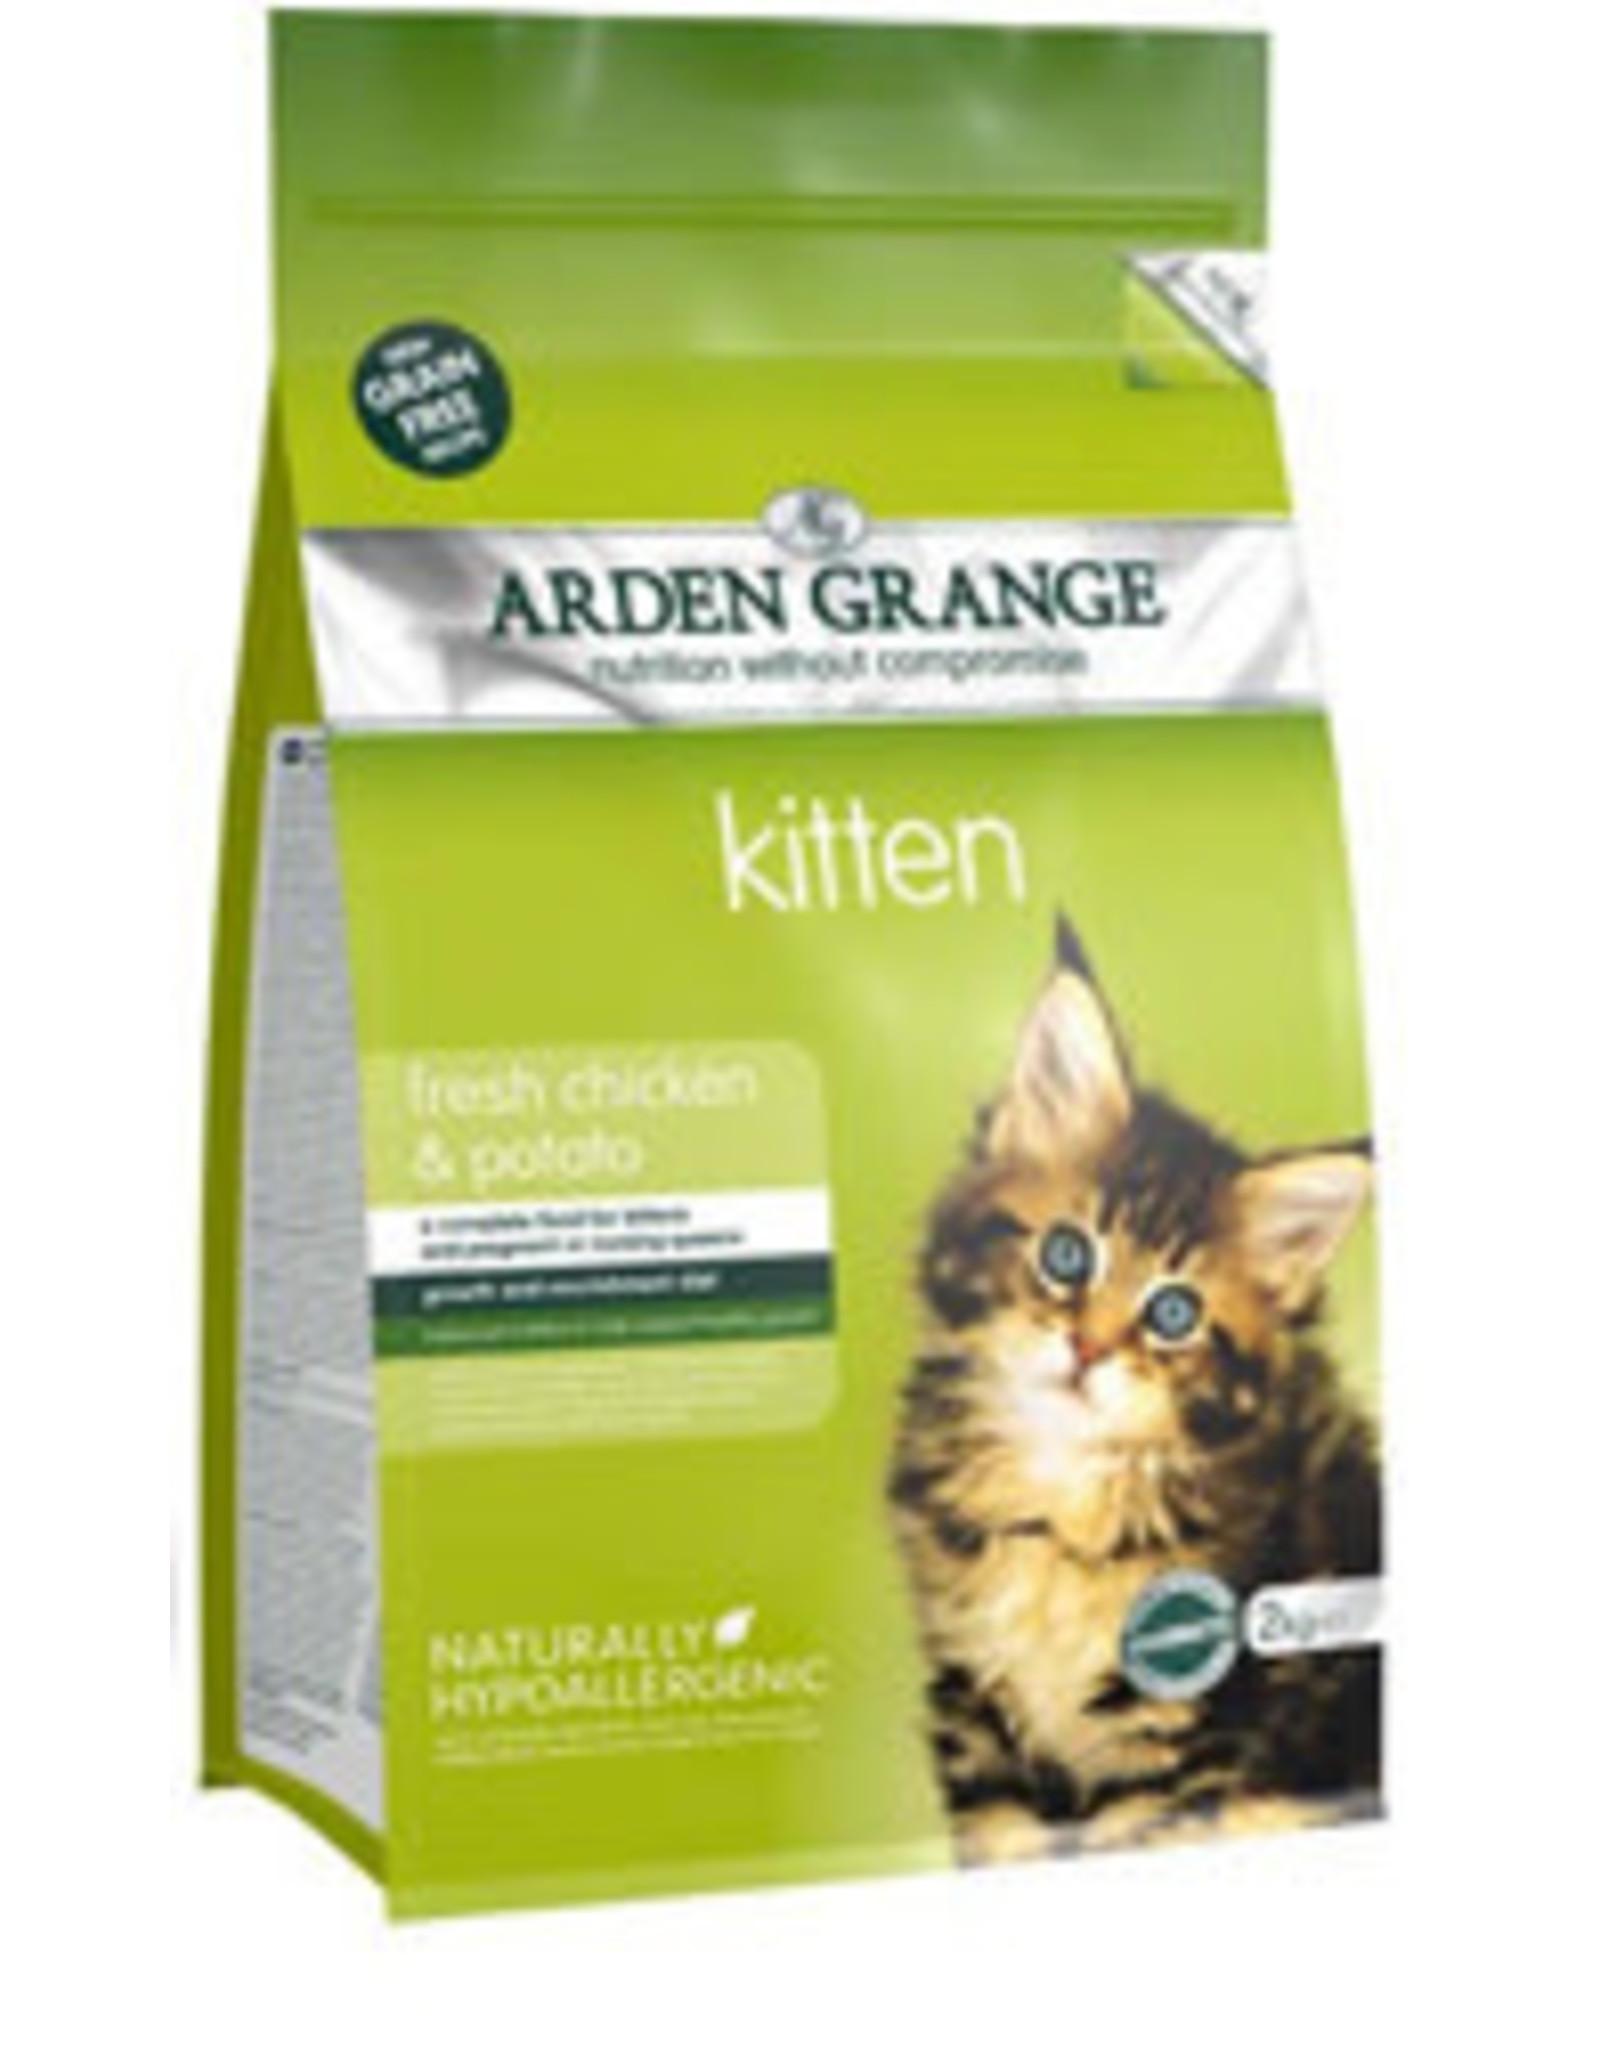 Arden Grange Grain Free Kitten Cat Dry Food, Chicken & Potato